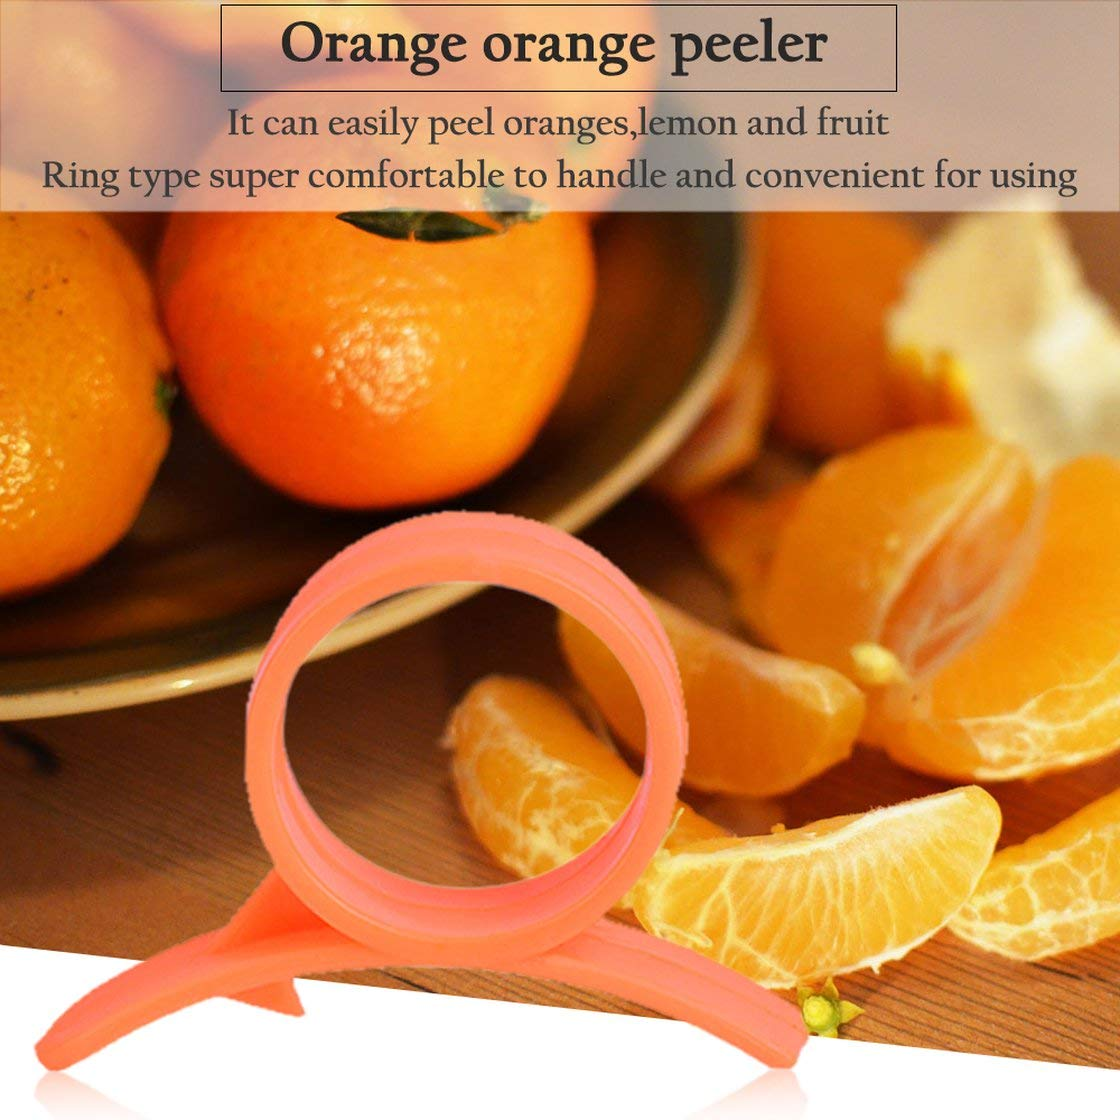 Pr/áctico Pelador de Naranja C/ómoda Cortadora de Frutas de Lim/ón Tipo de Anillo Dispositivo de Naranja Abierto Inteligente Novela Herramienta de Cocina